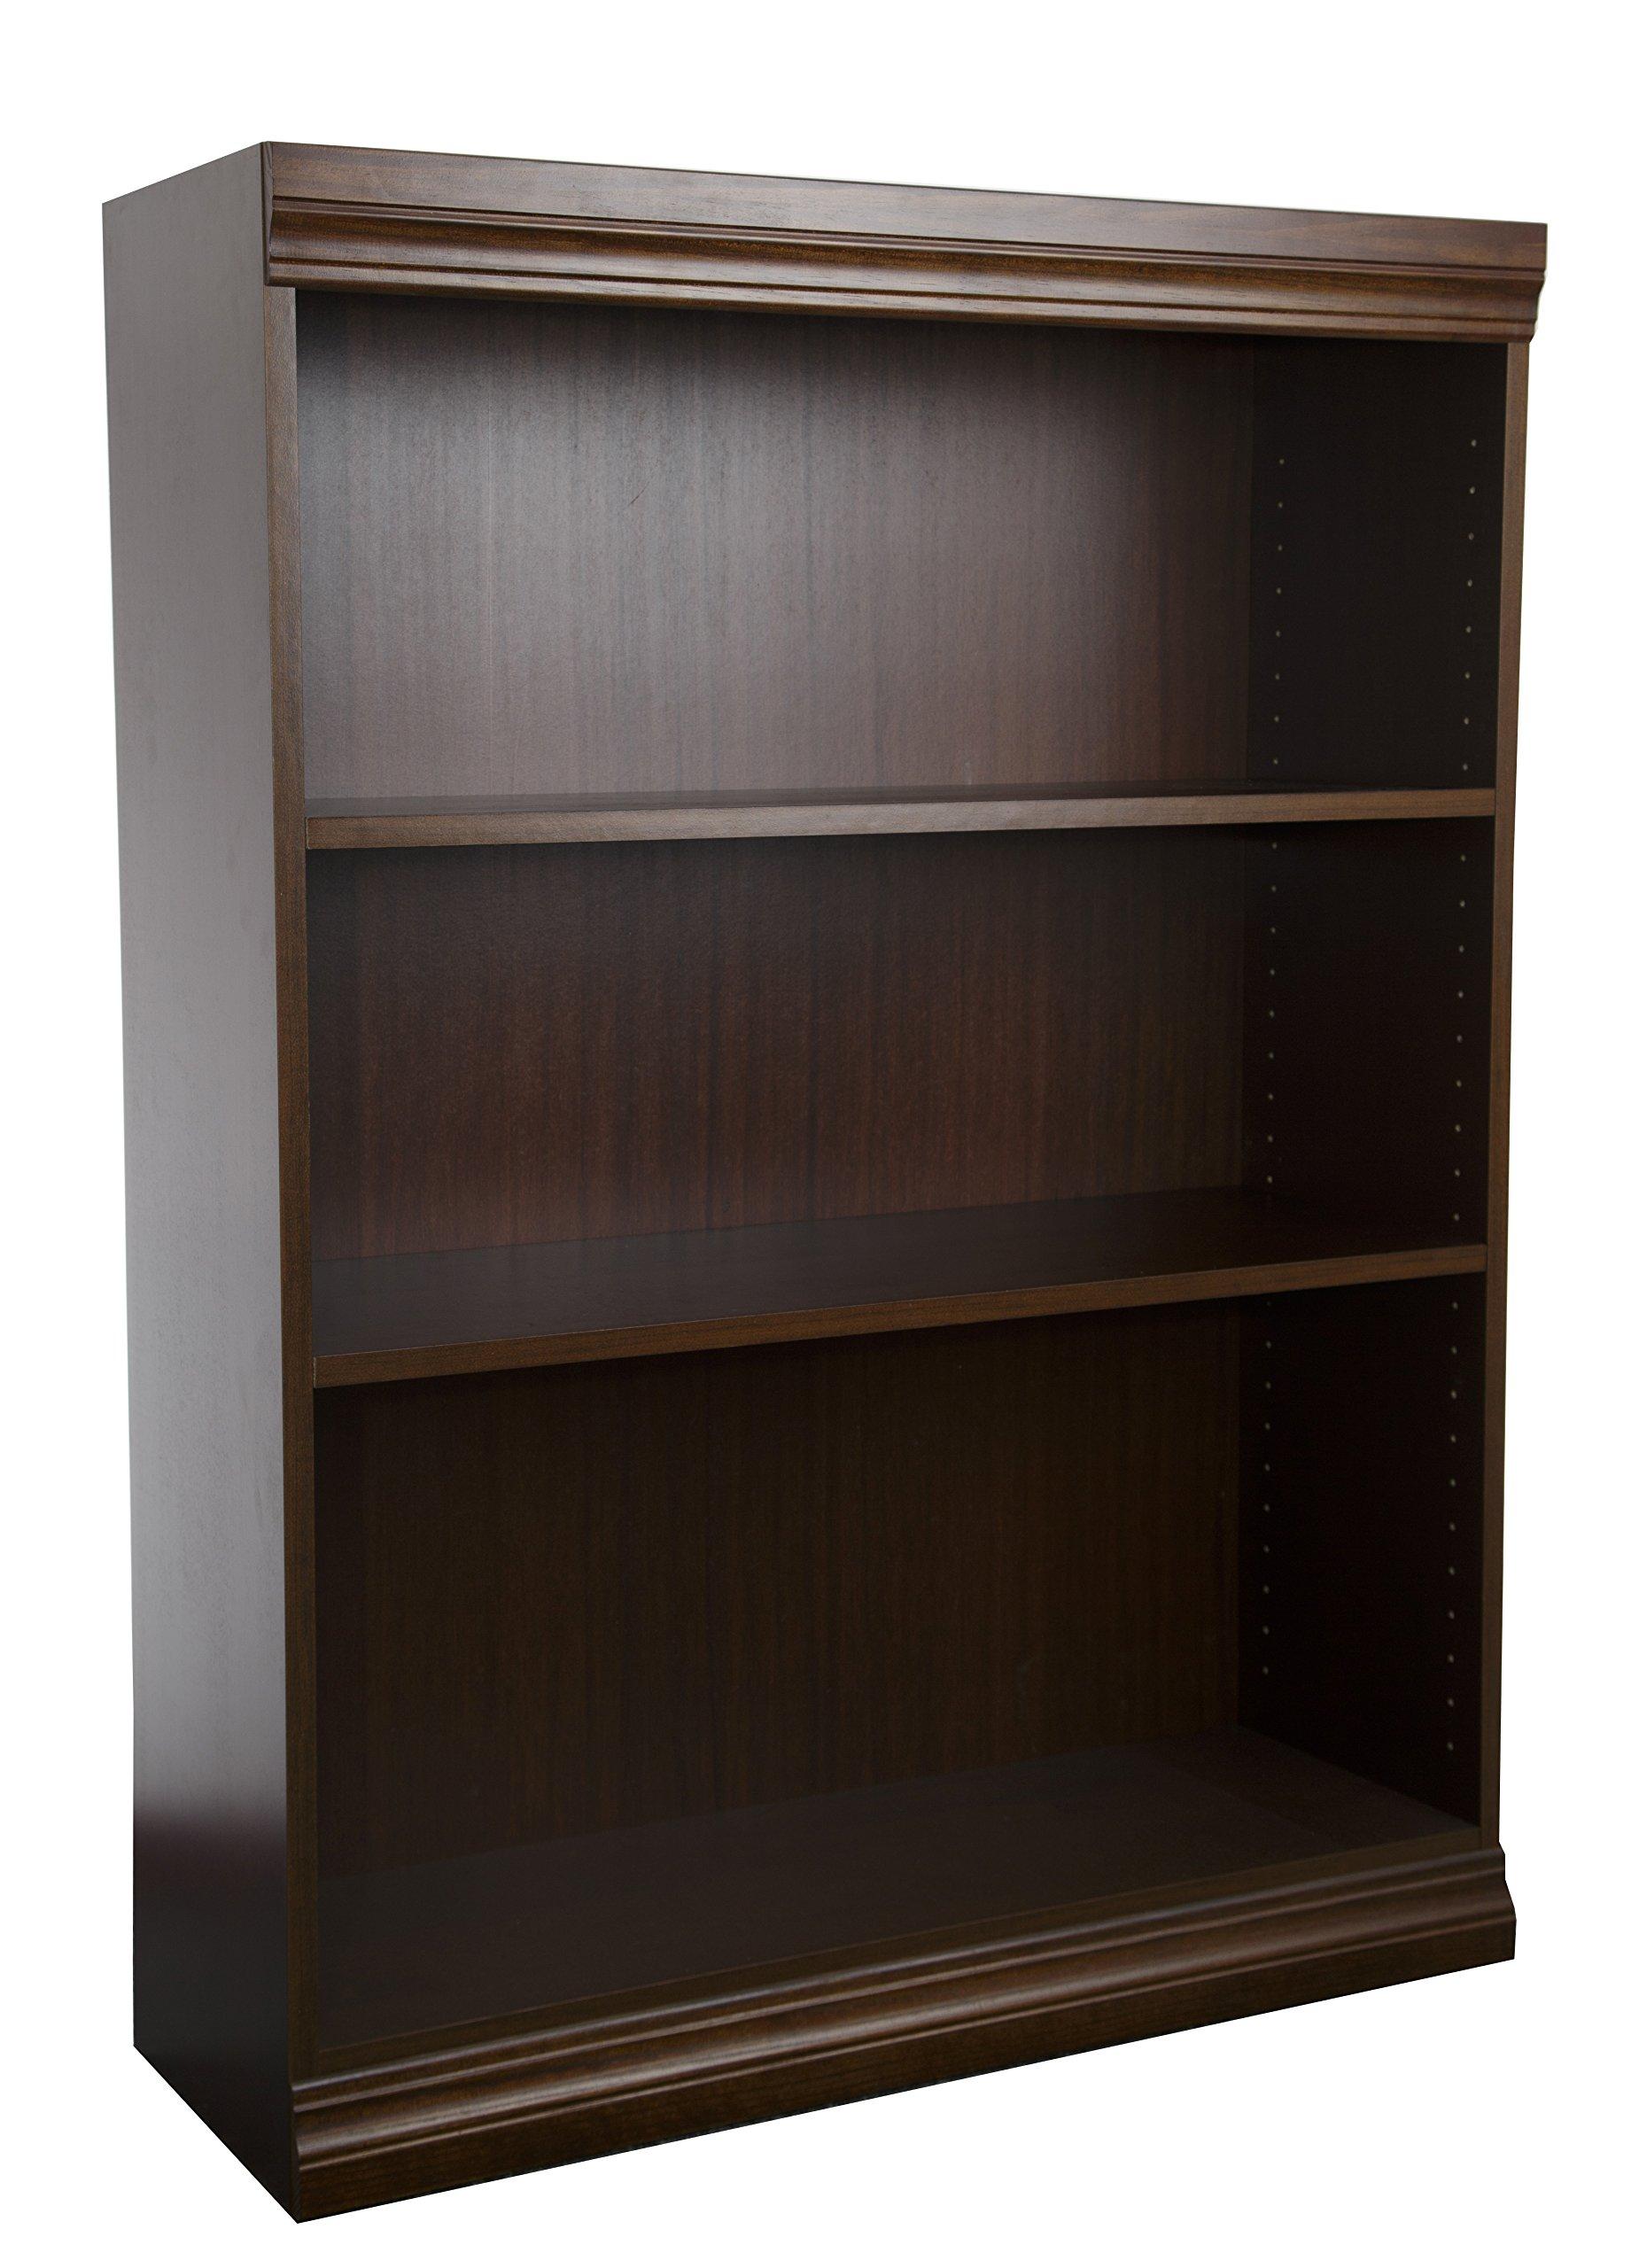 Norsons Industries Jefferson Traditional Wood Veneer Bookcase with Heavy Duty Shelf, 48-Inch, Vintage Walnut